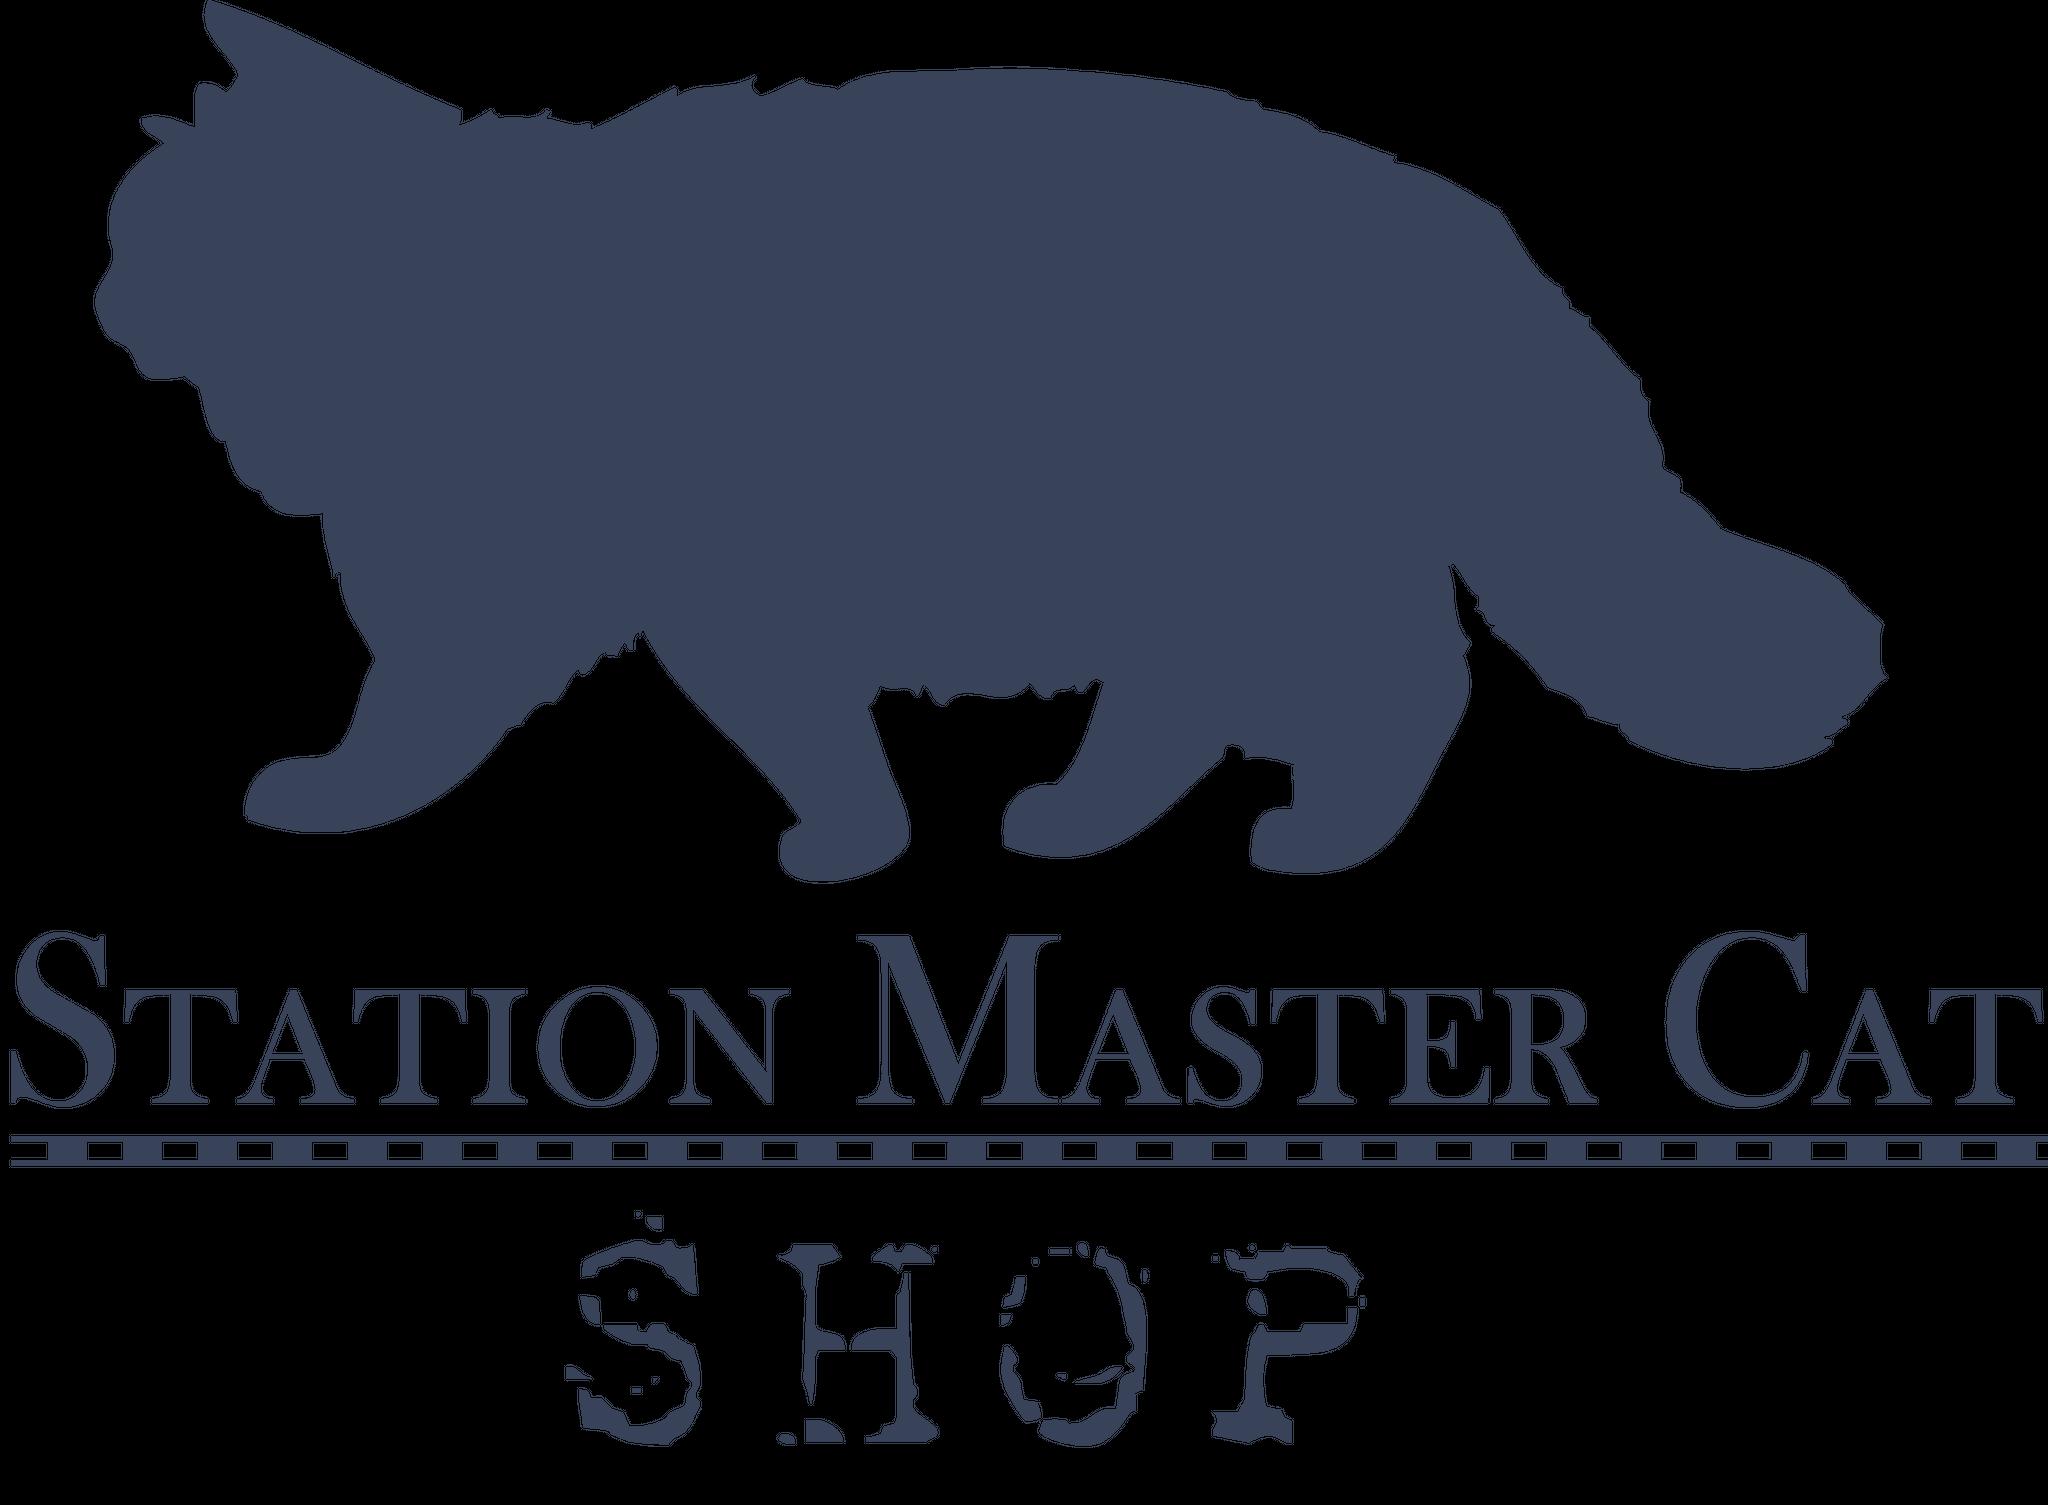 Station Master Cat